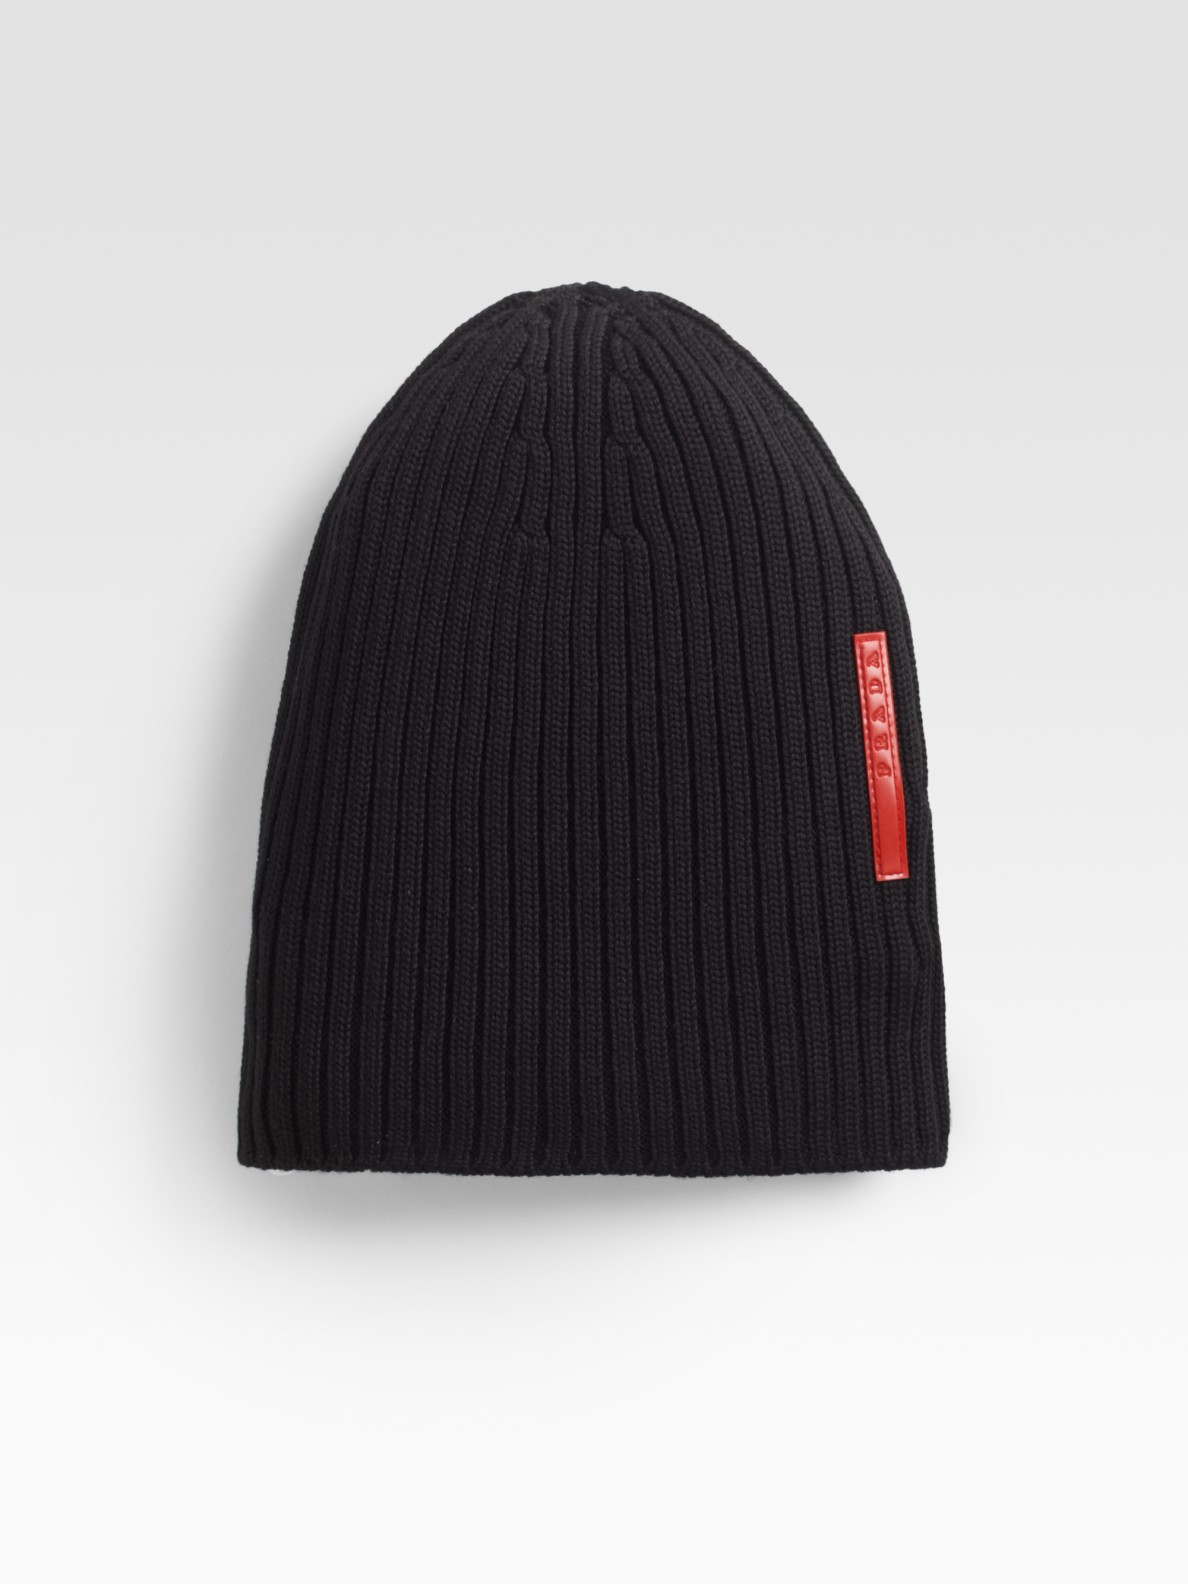 Prada Ribbed Knit Beanie in Black for Men  7a4f15c572bd